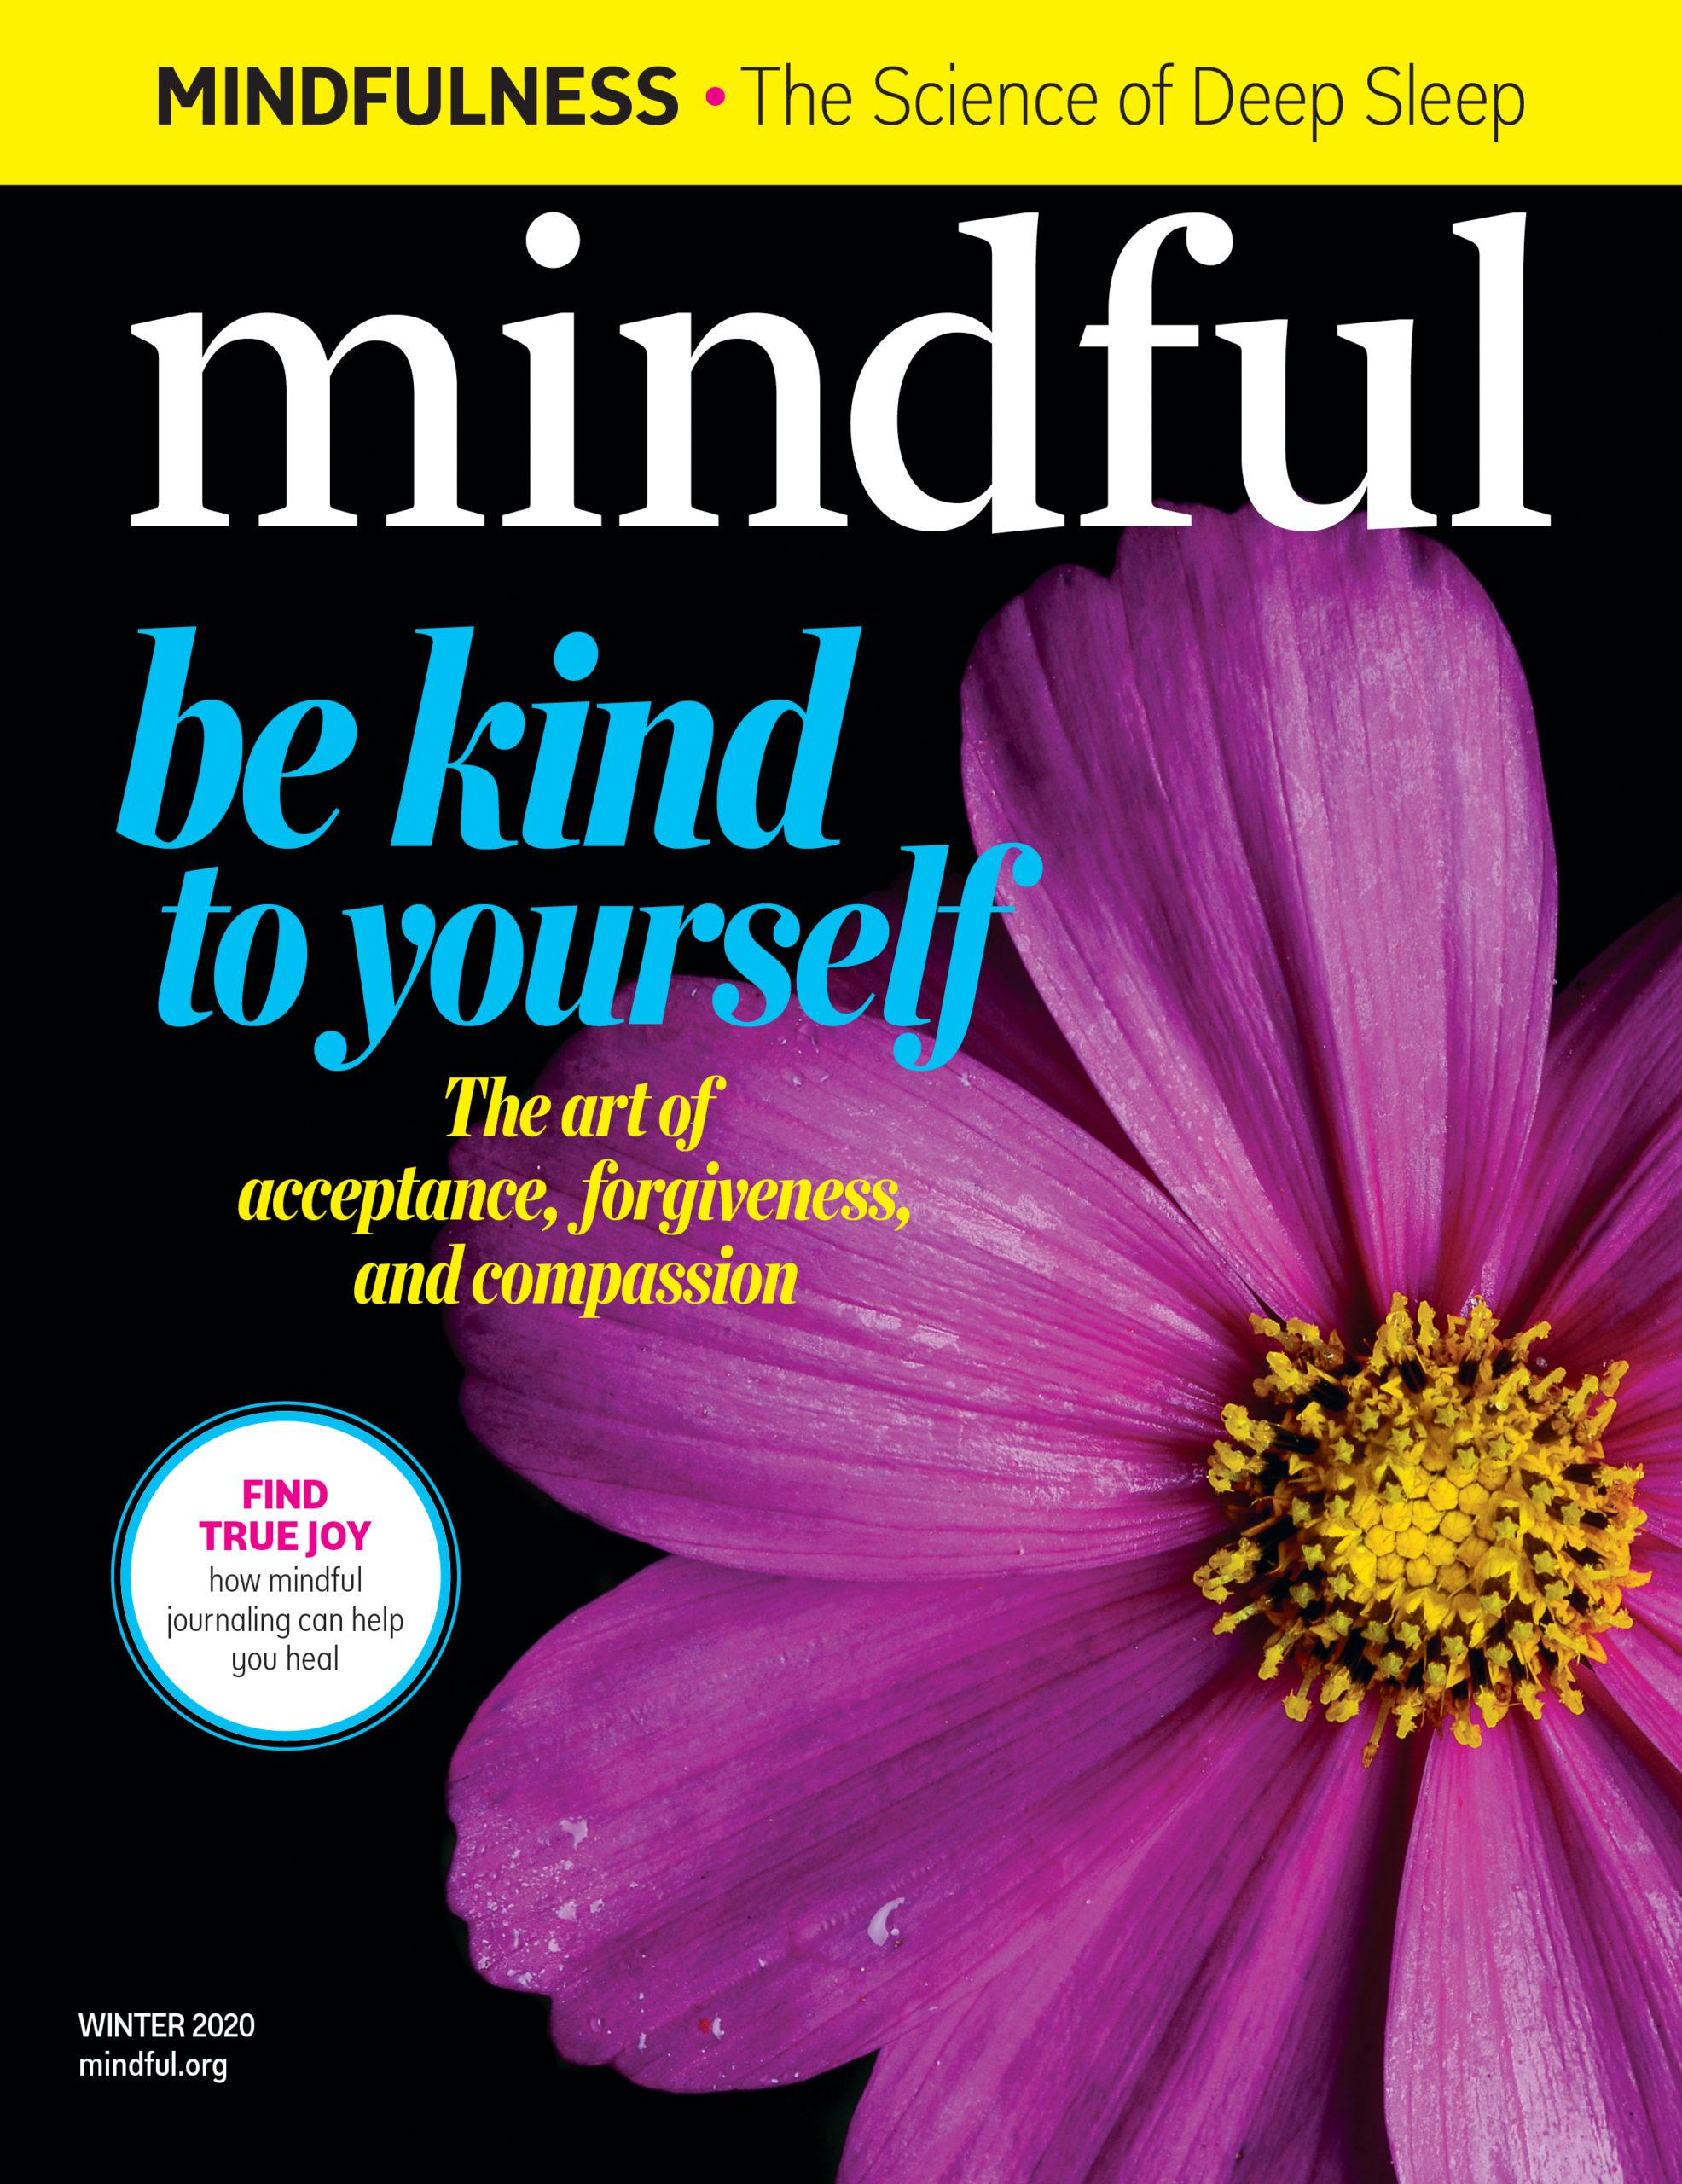 Mindful Magazine —Mindfulness and the Science of Deep Sleep